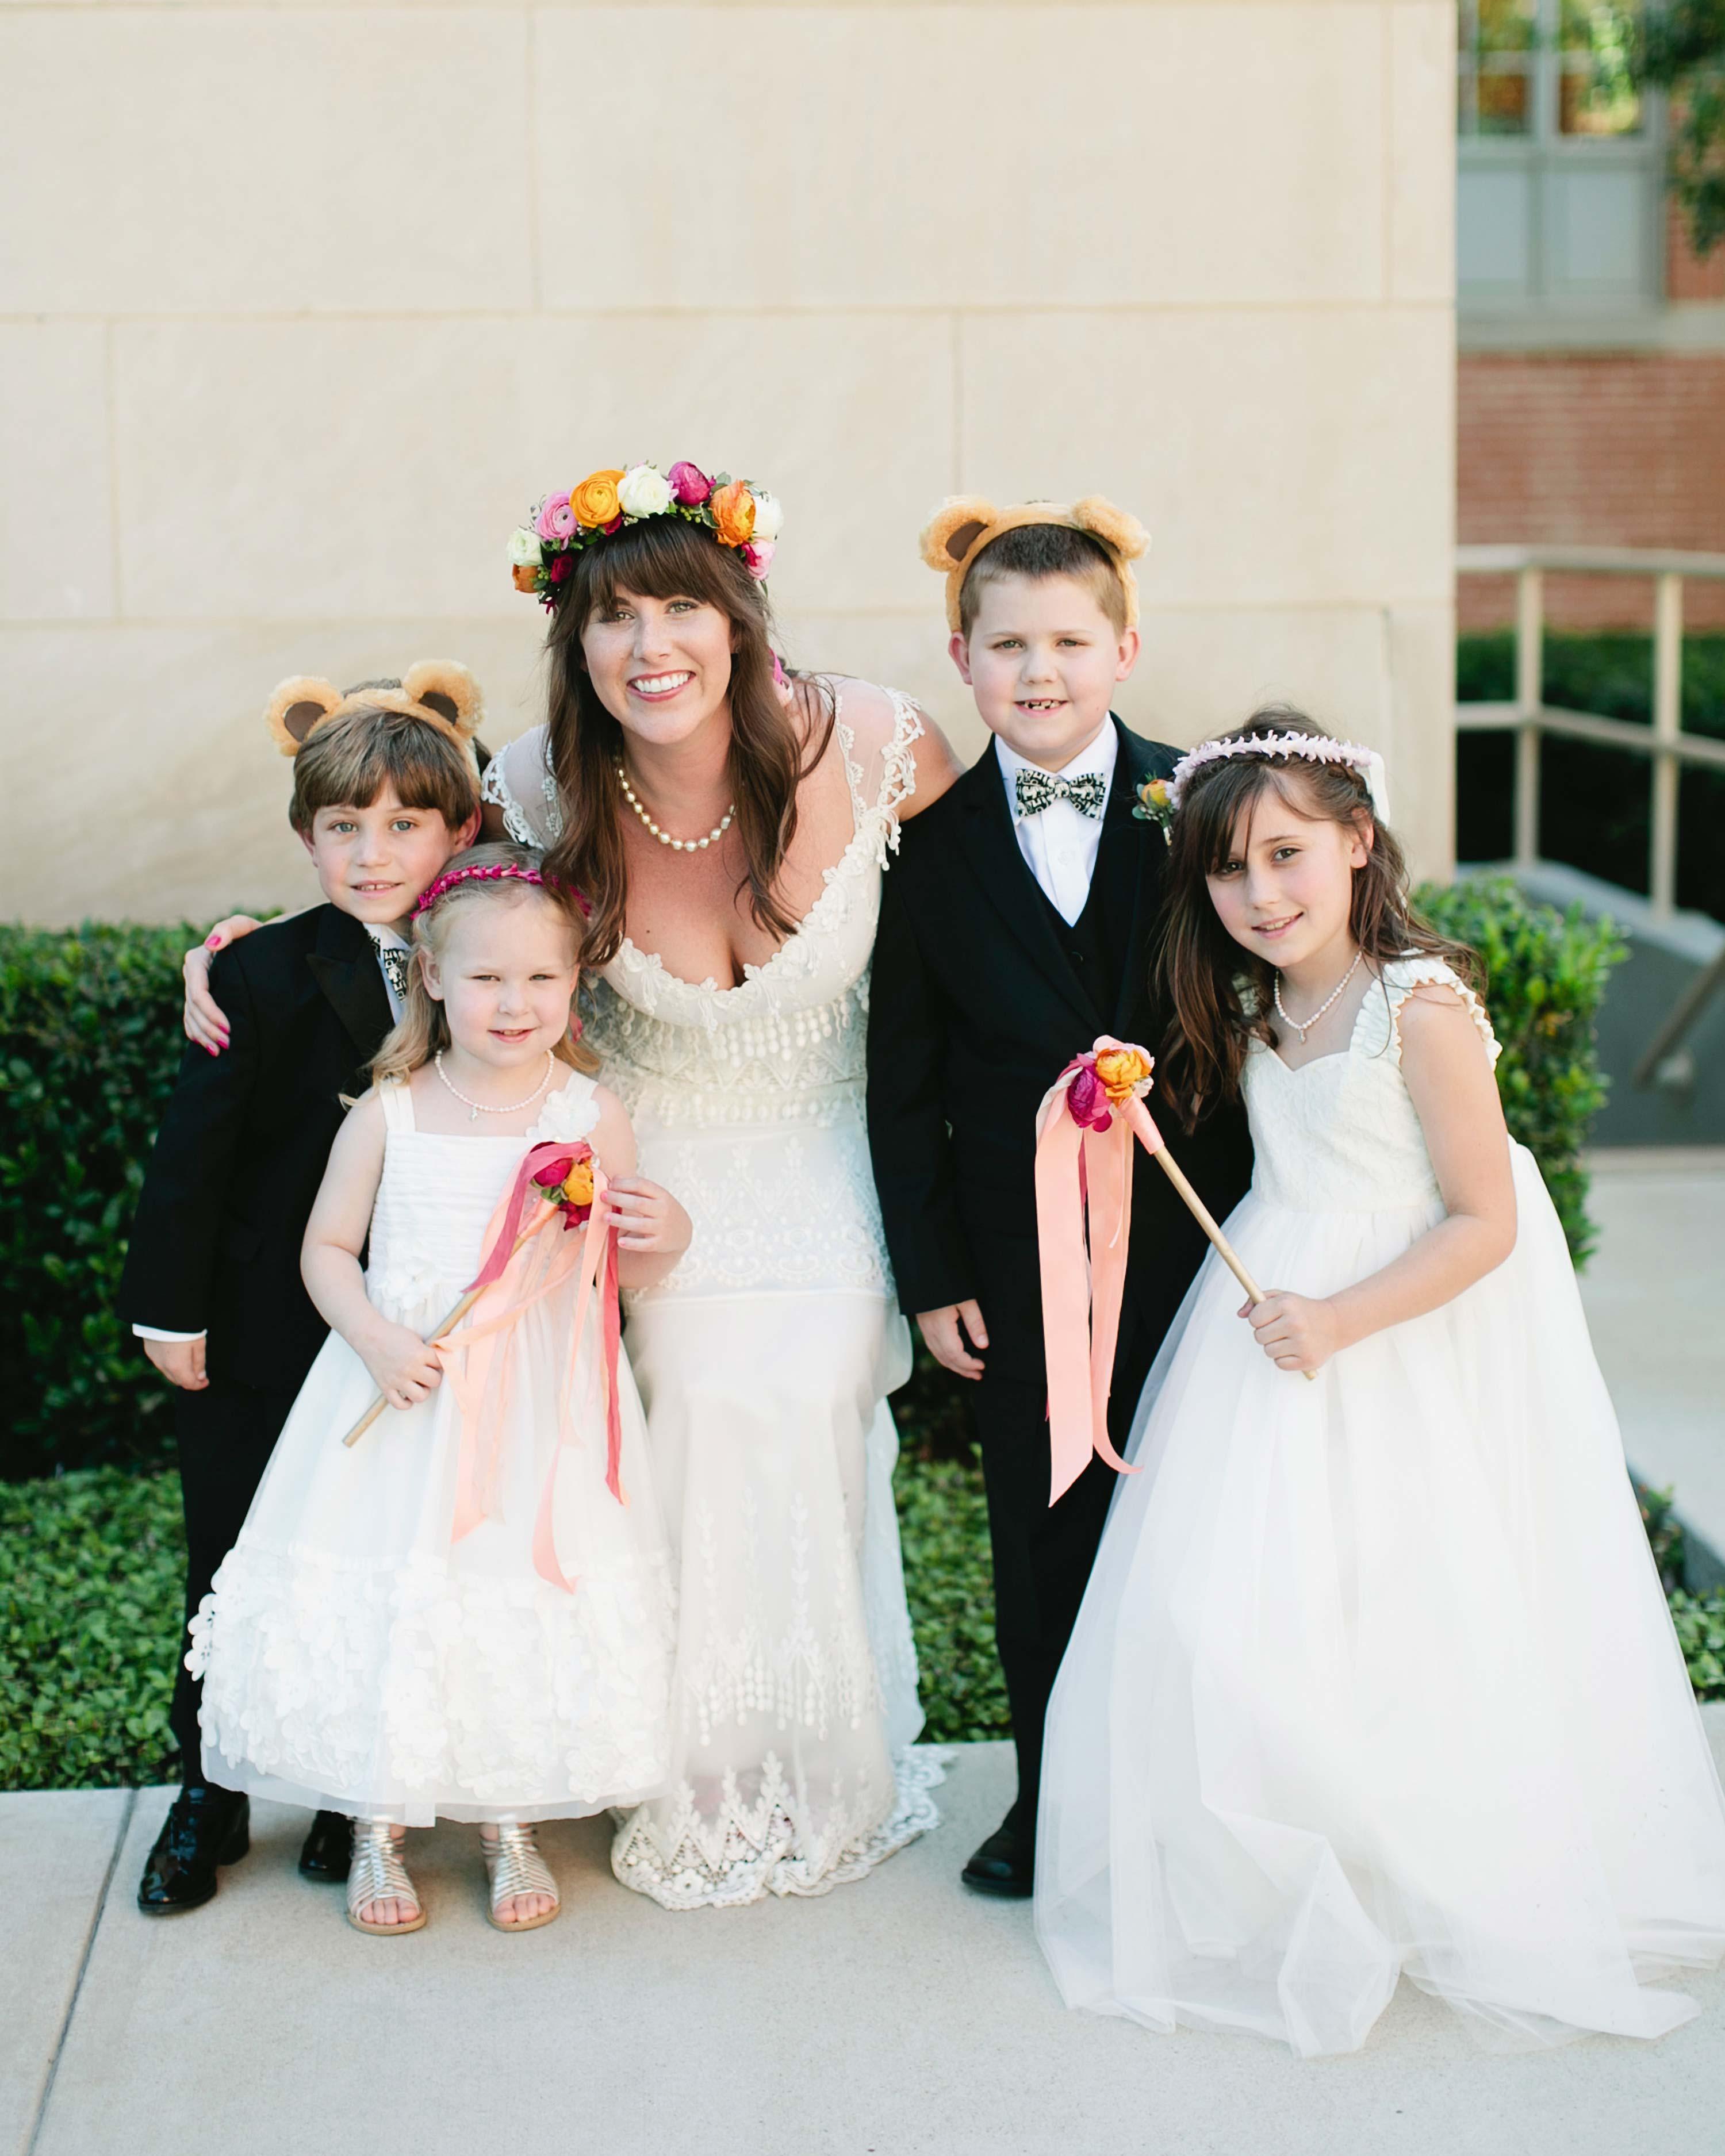 holly-john-wedding-texas-kids-043-s112833-0516.jpg